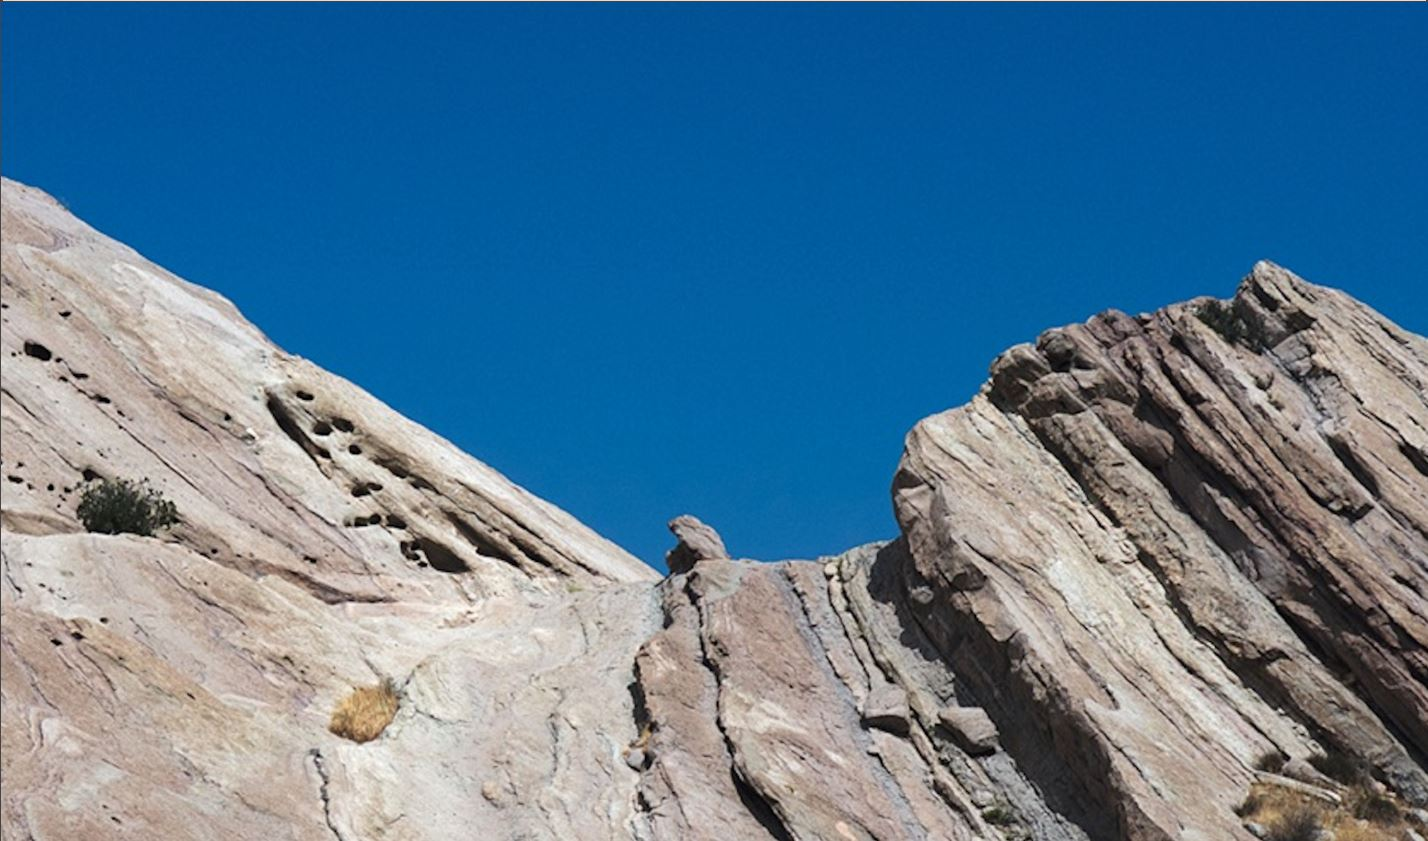 LNEG lança novo Geoportal da Energia e Geologia